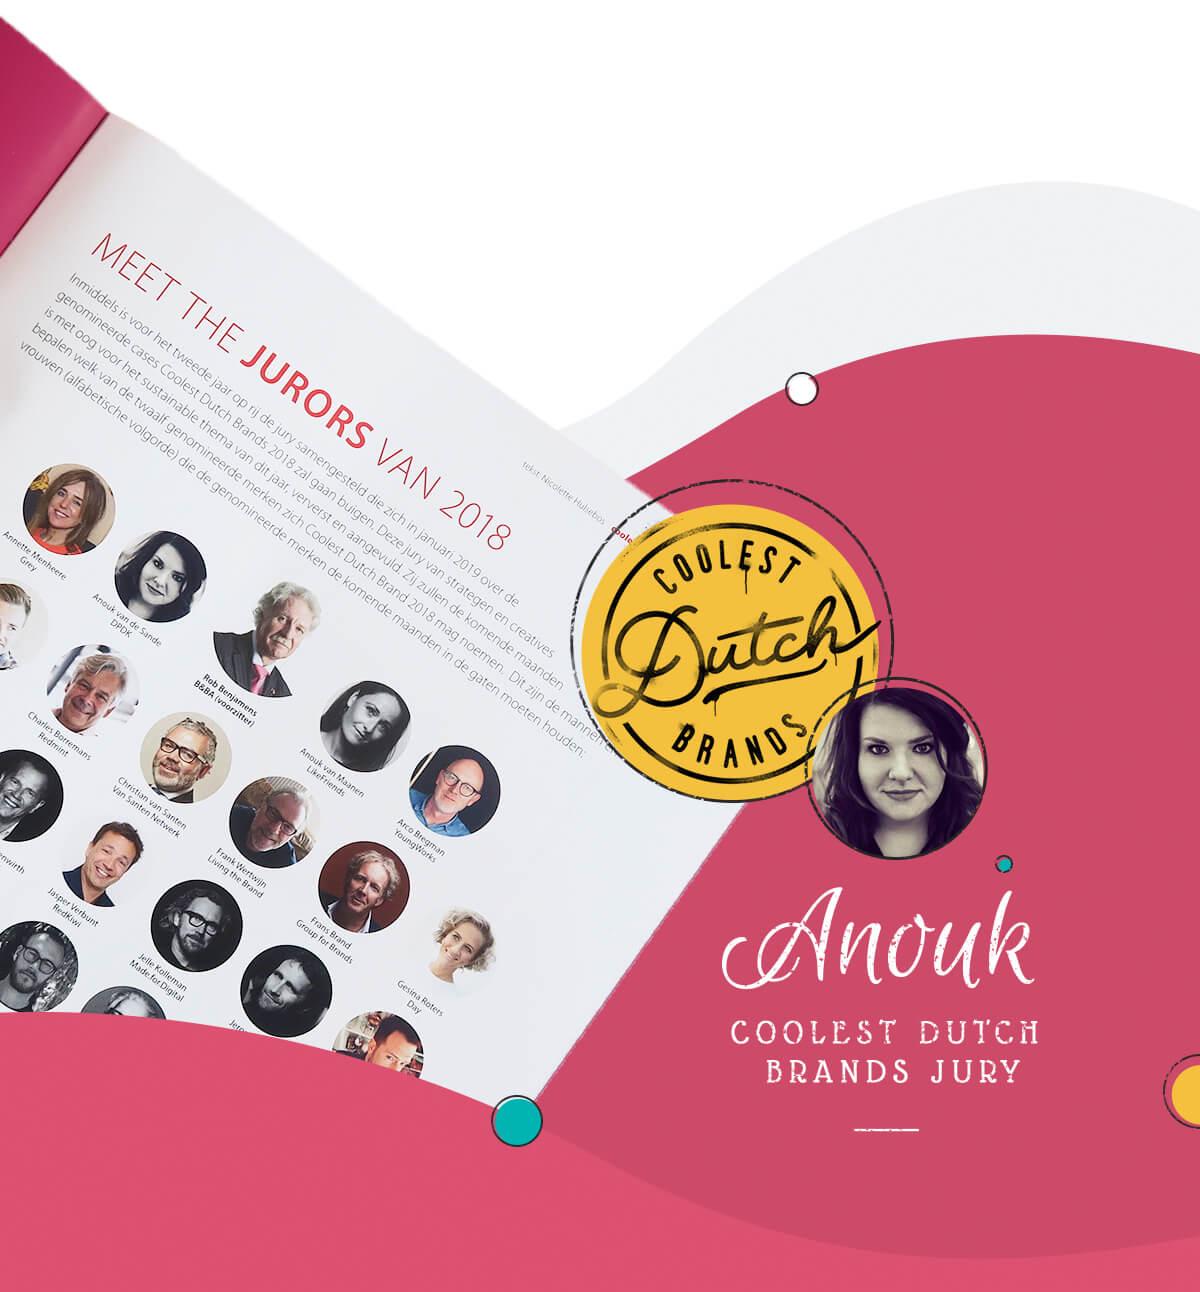 Anouk coolest dutch brands jury